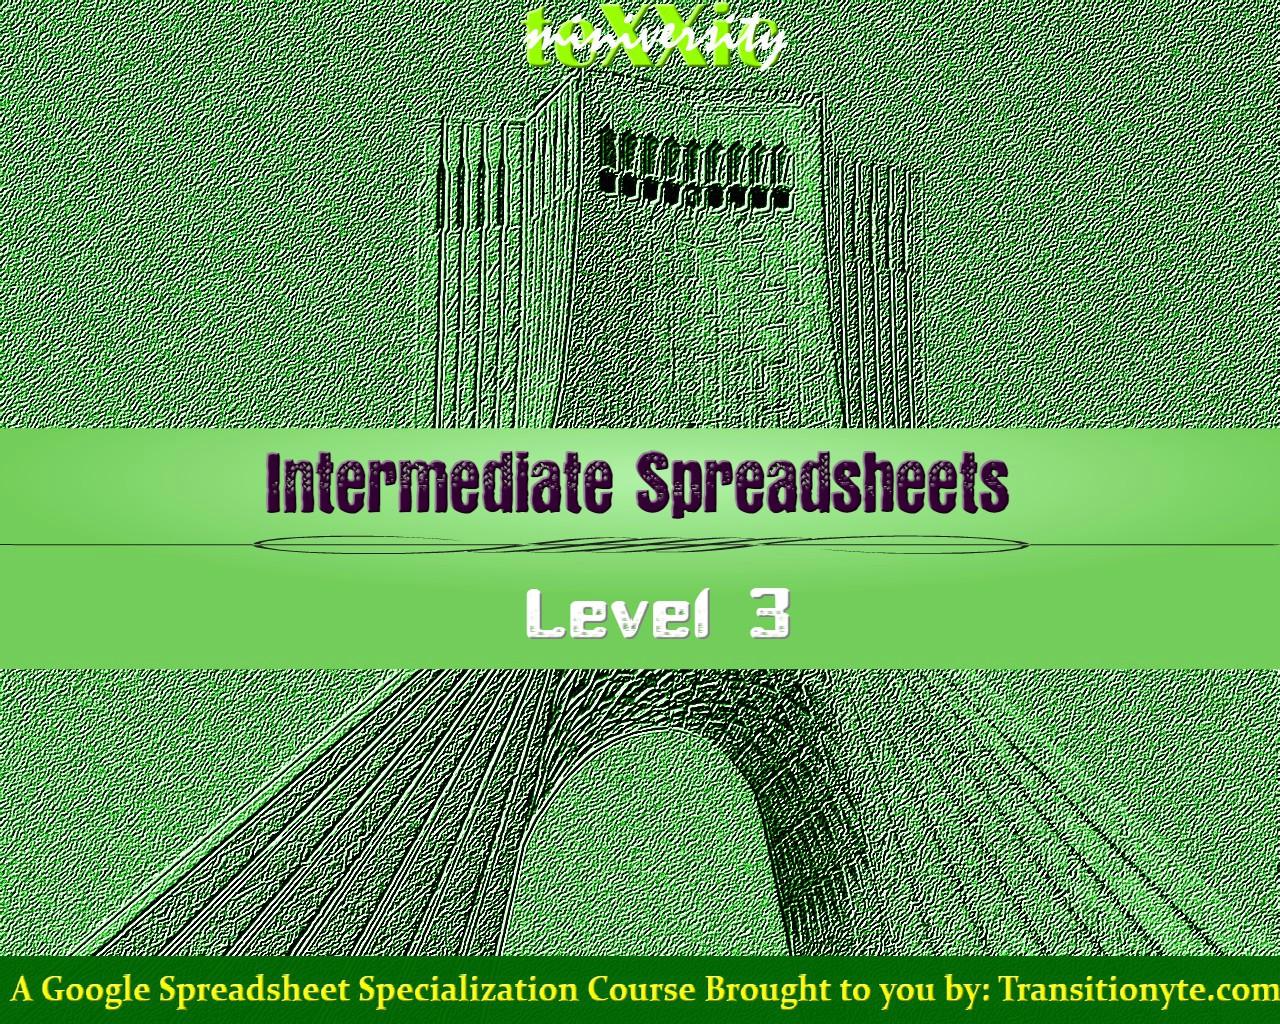 TeXXic Miniversity - Intermediate Spreadsheet Level 3